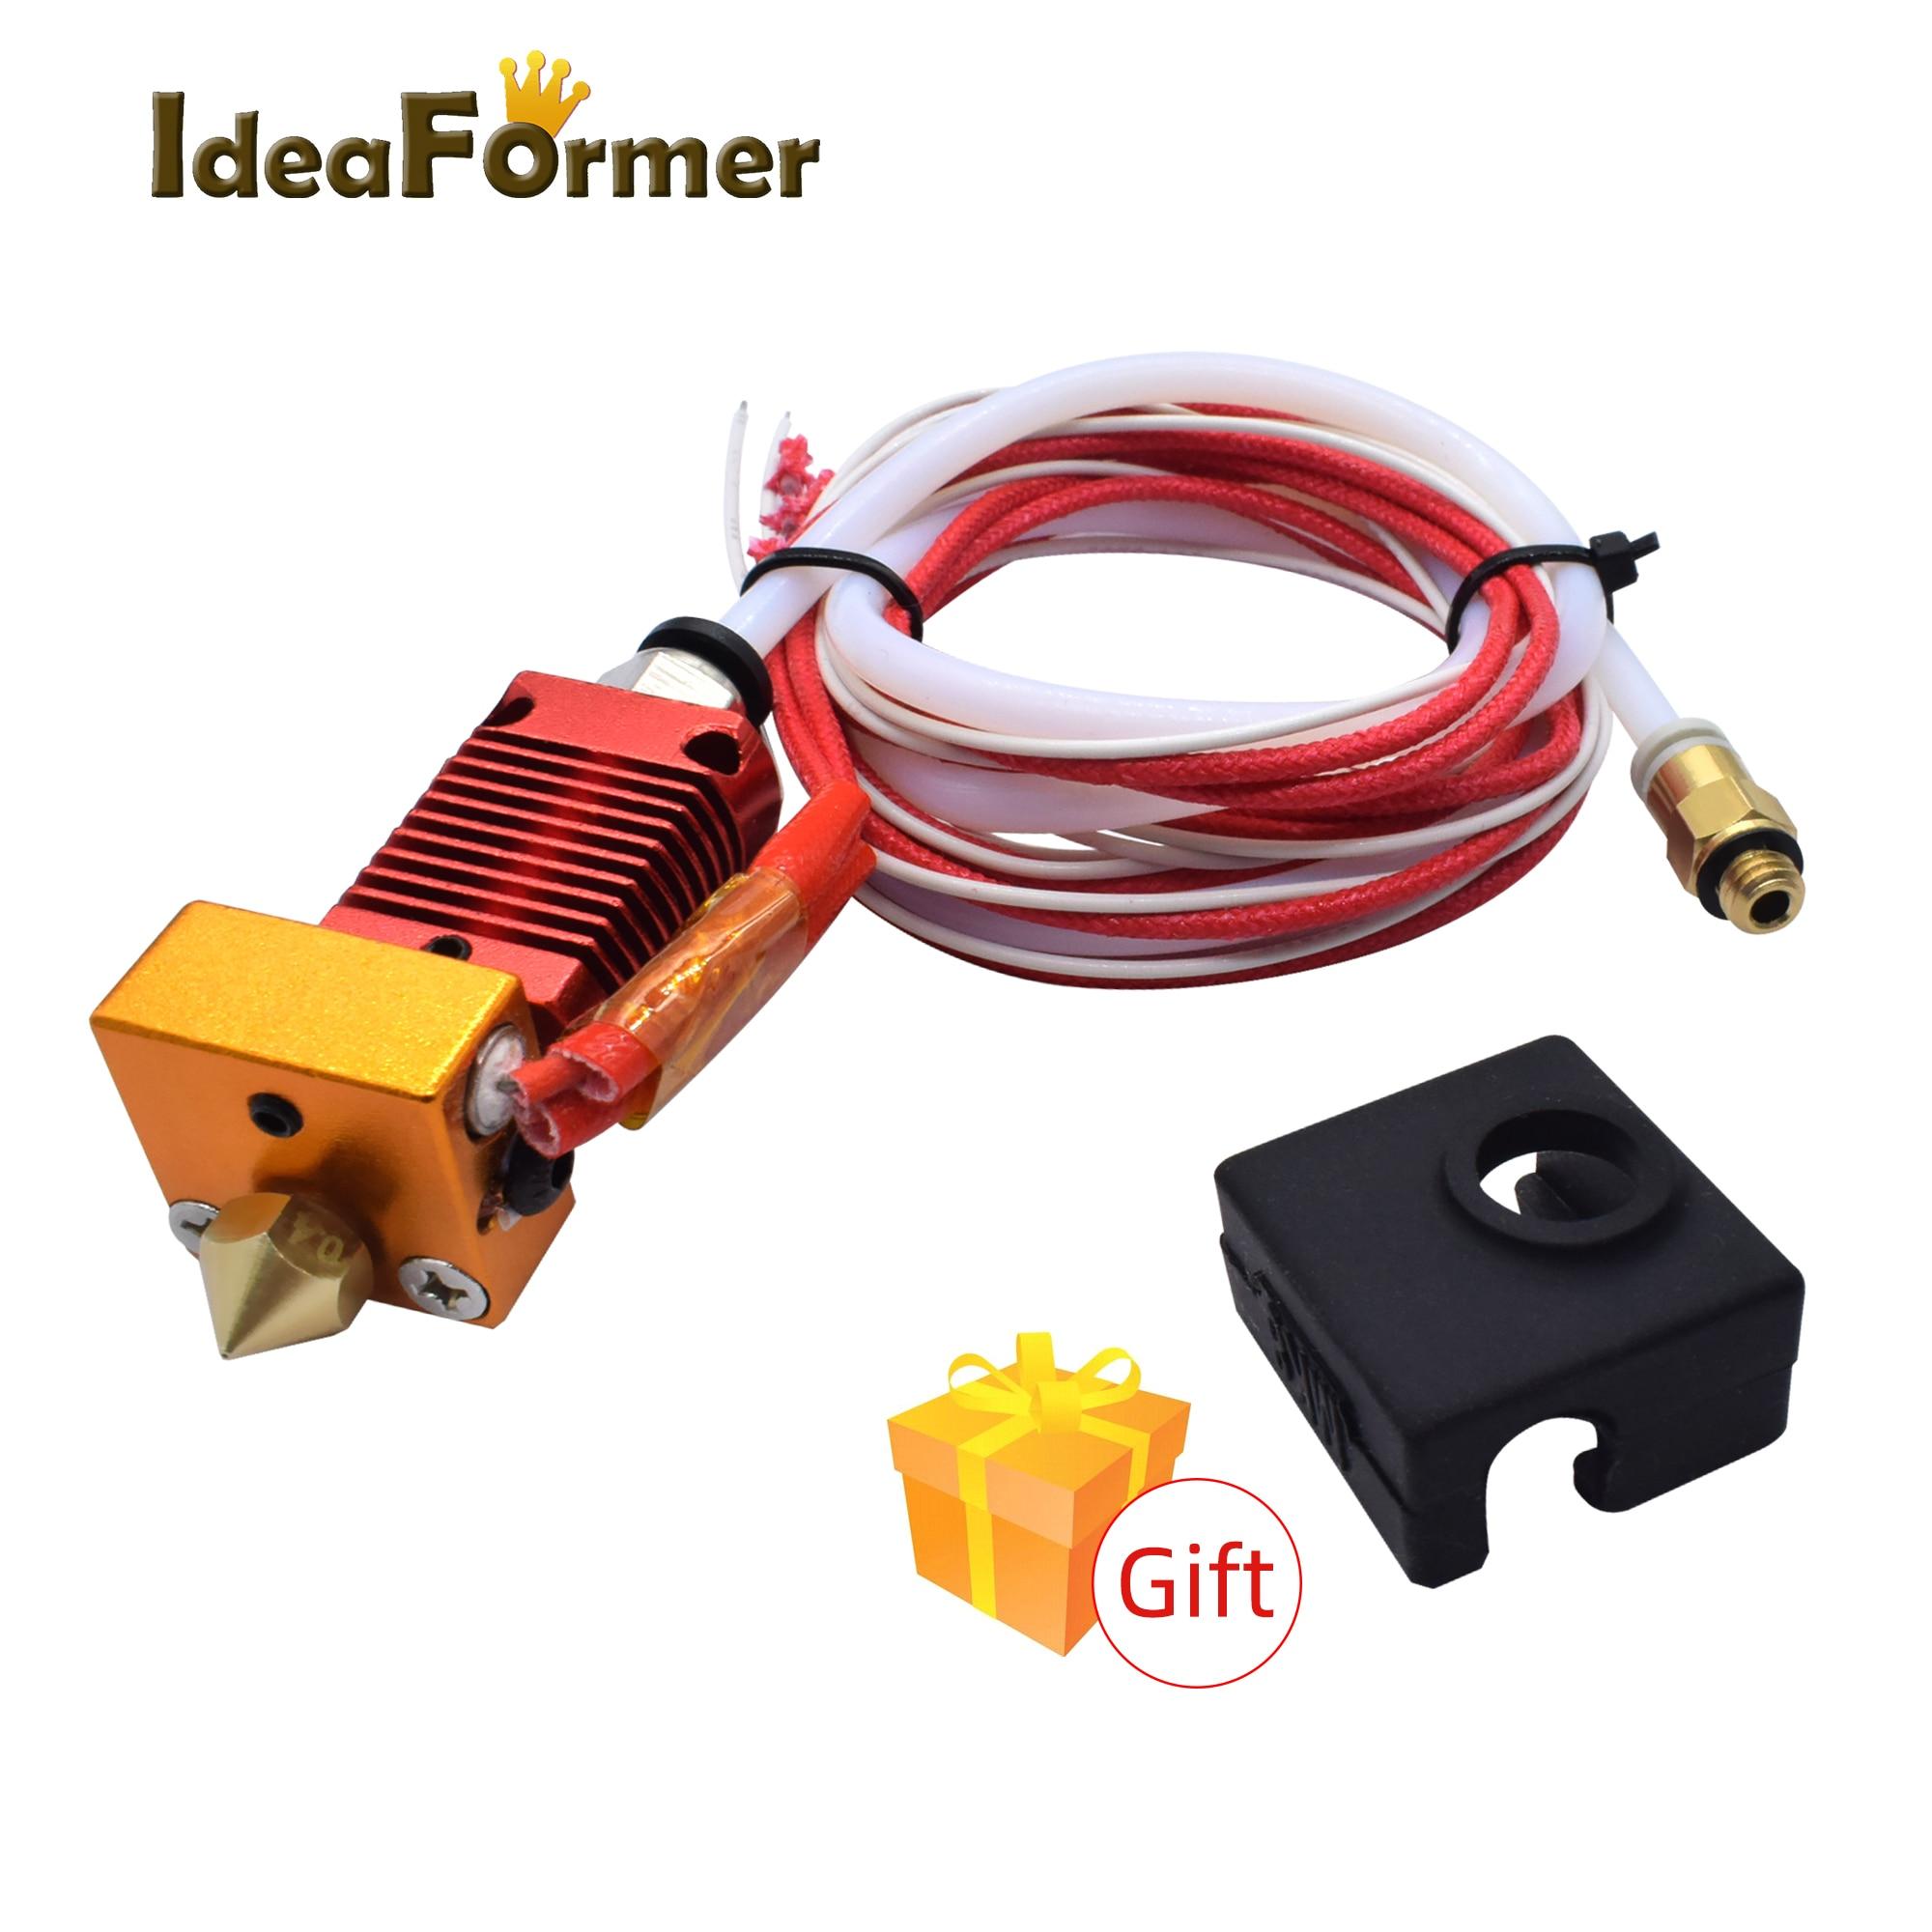 1set 3D Printer Parts CR10 Hotend Extruder kit 12V 24V for Ender-3 CR10 Printer 1 75mm 0 4mm Nozzle Aluminum Heated Block parts